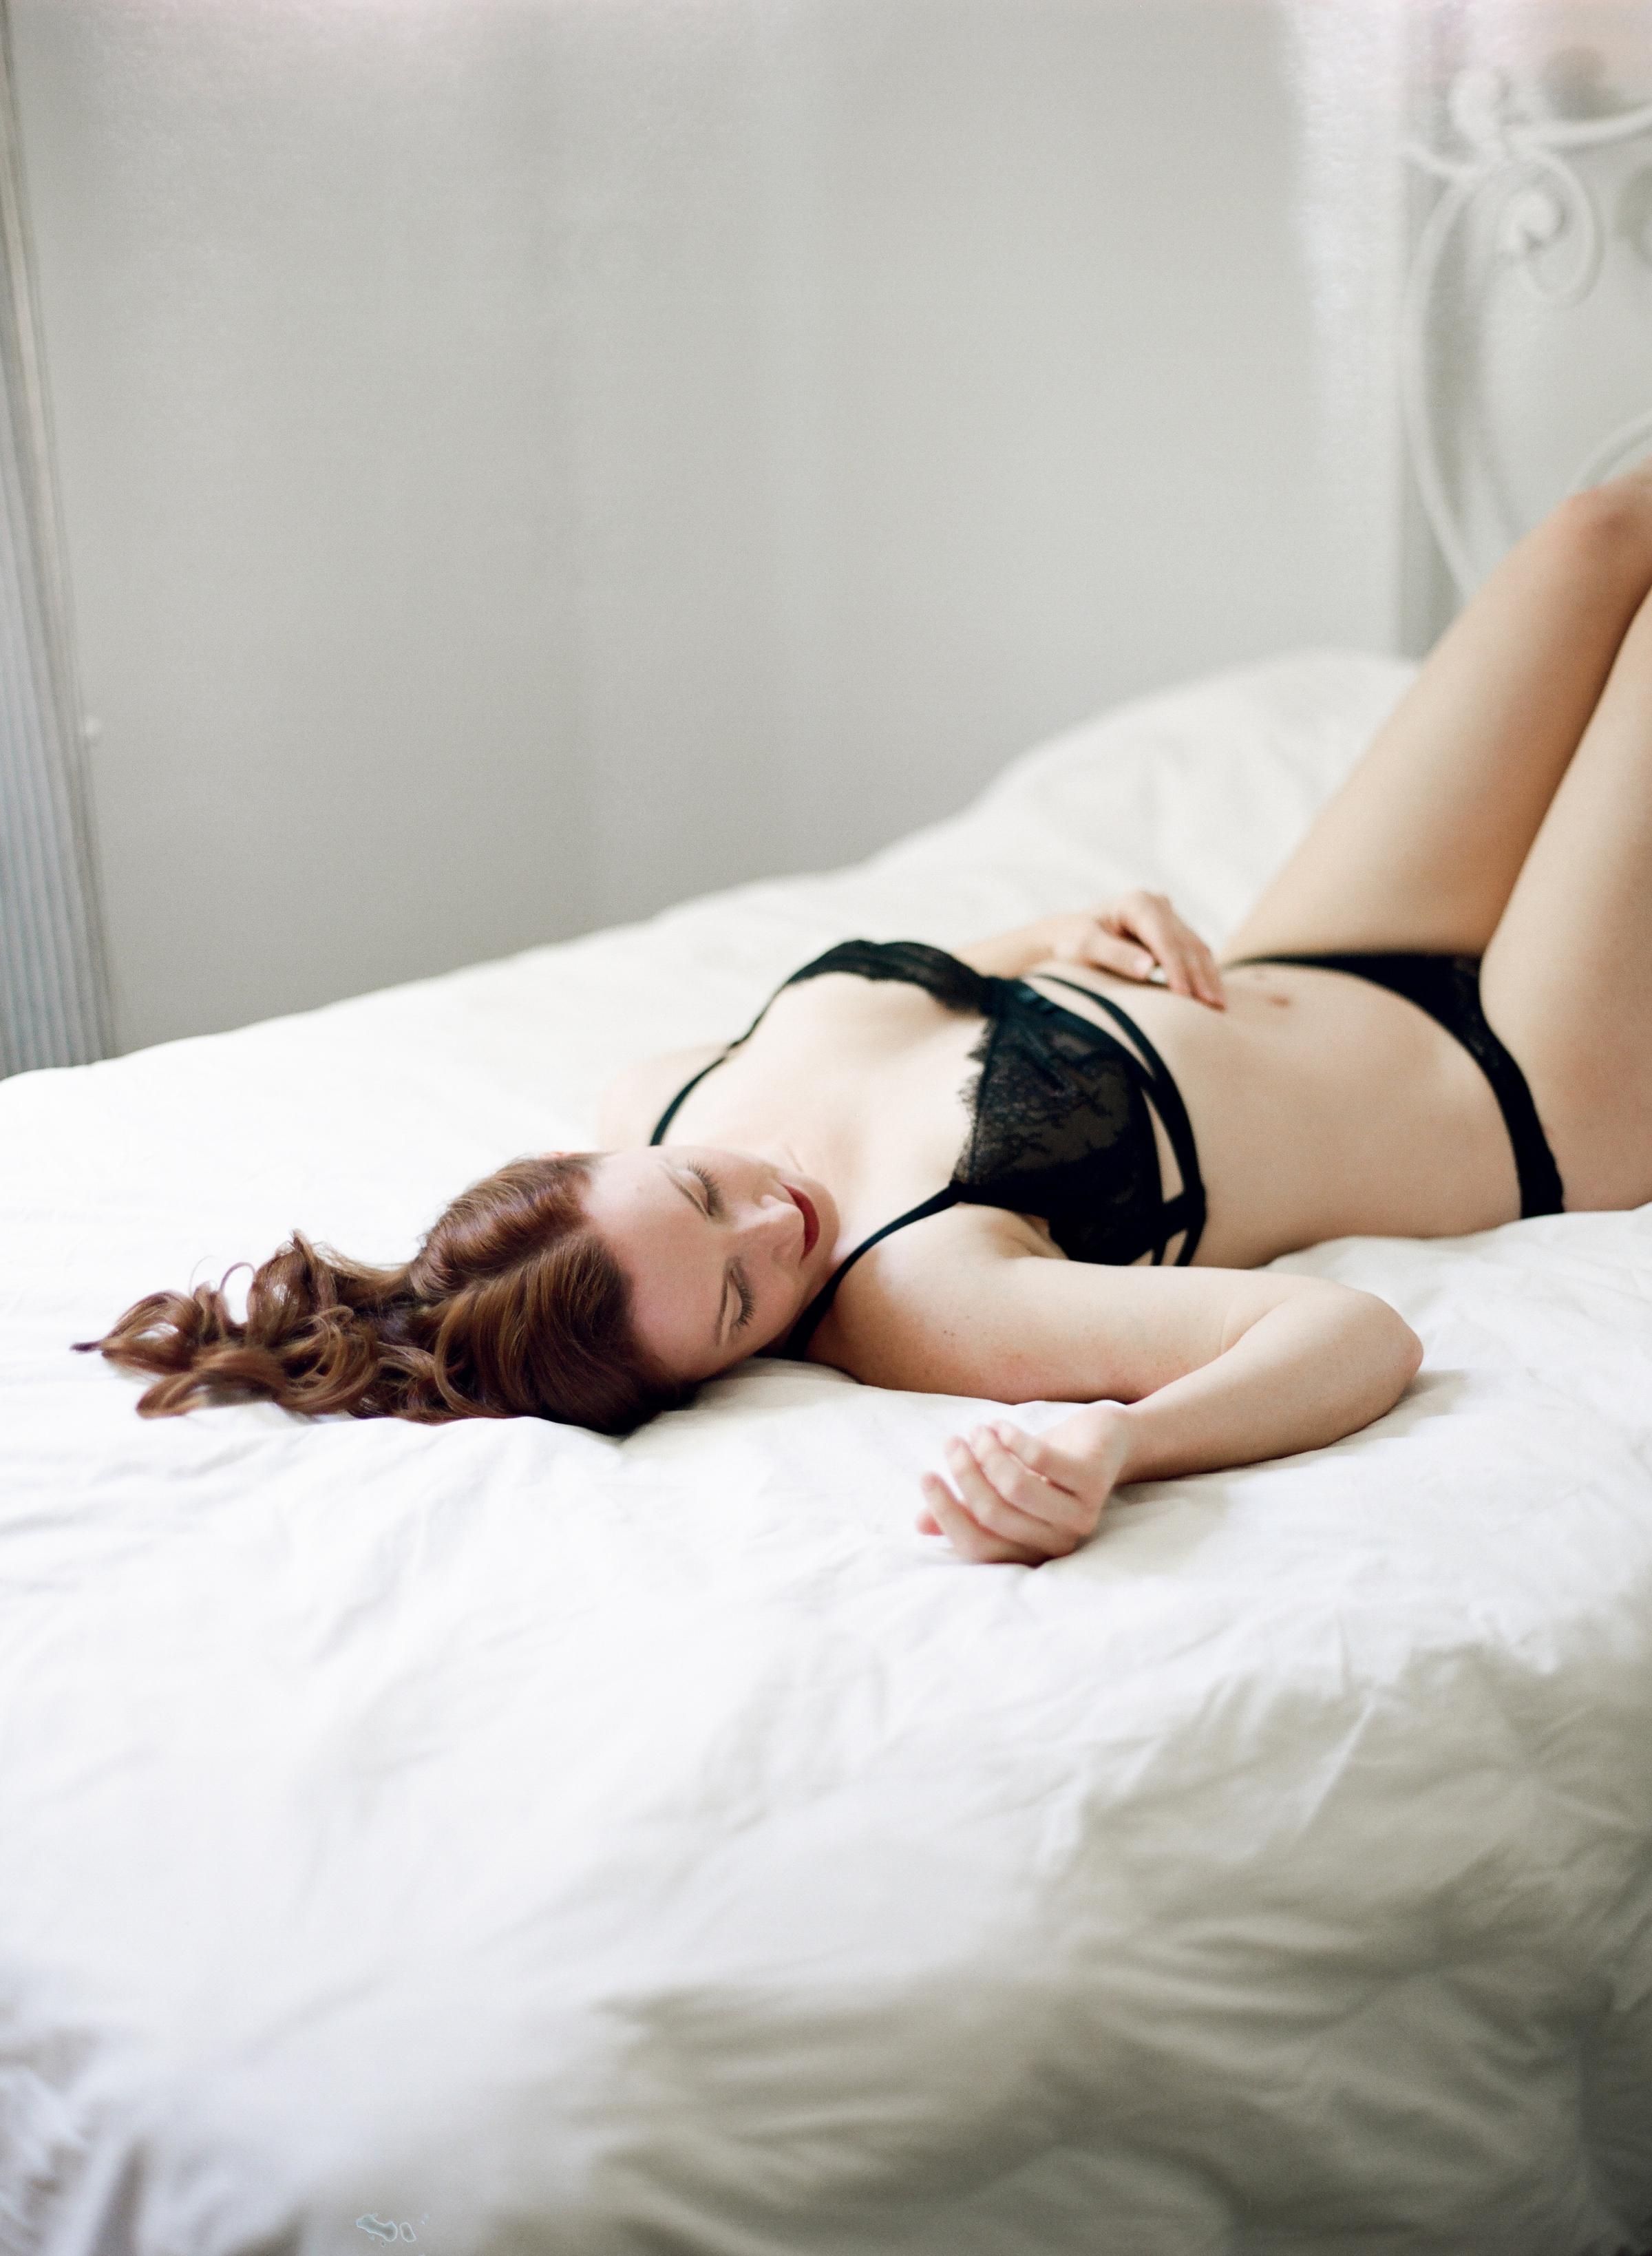 tallahassee_boudoir_photographer_shannon_griffin_0017.jpg